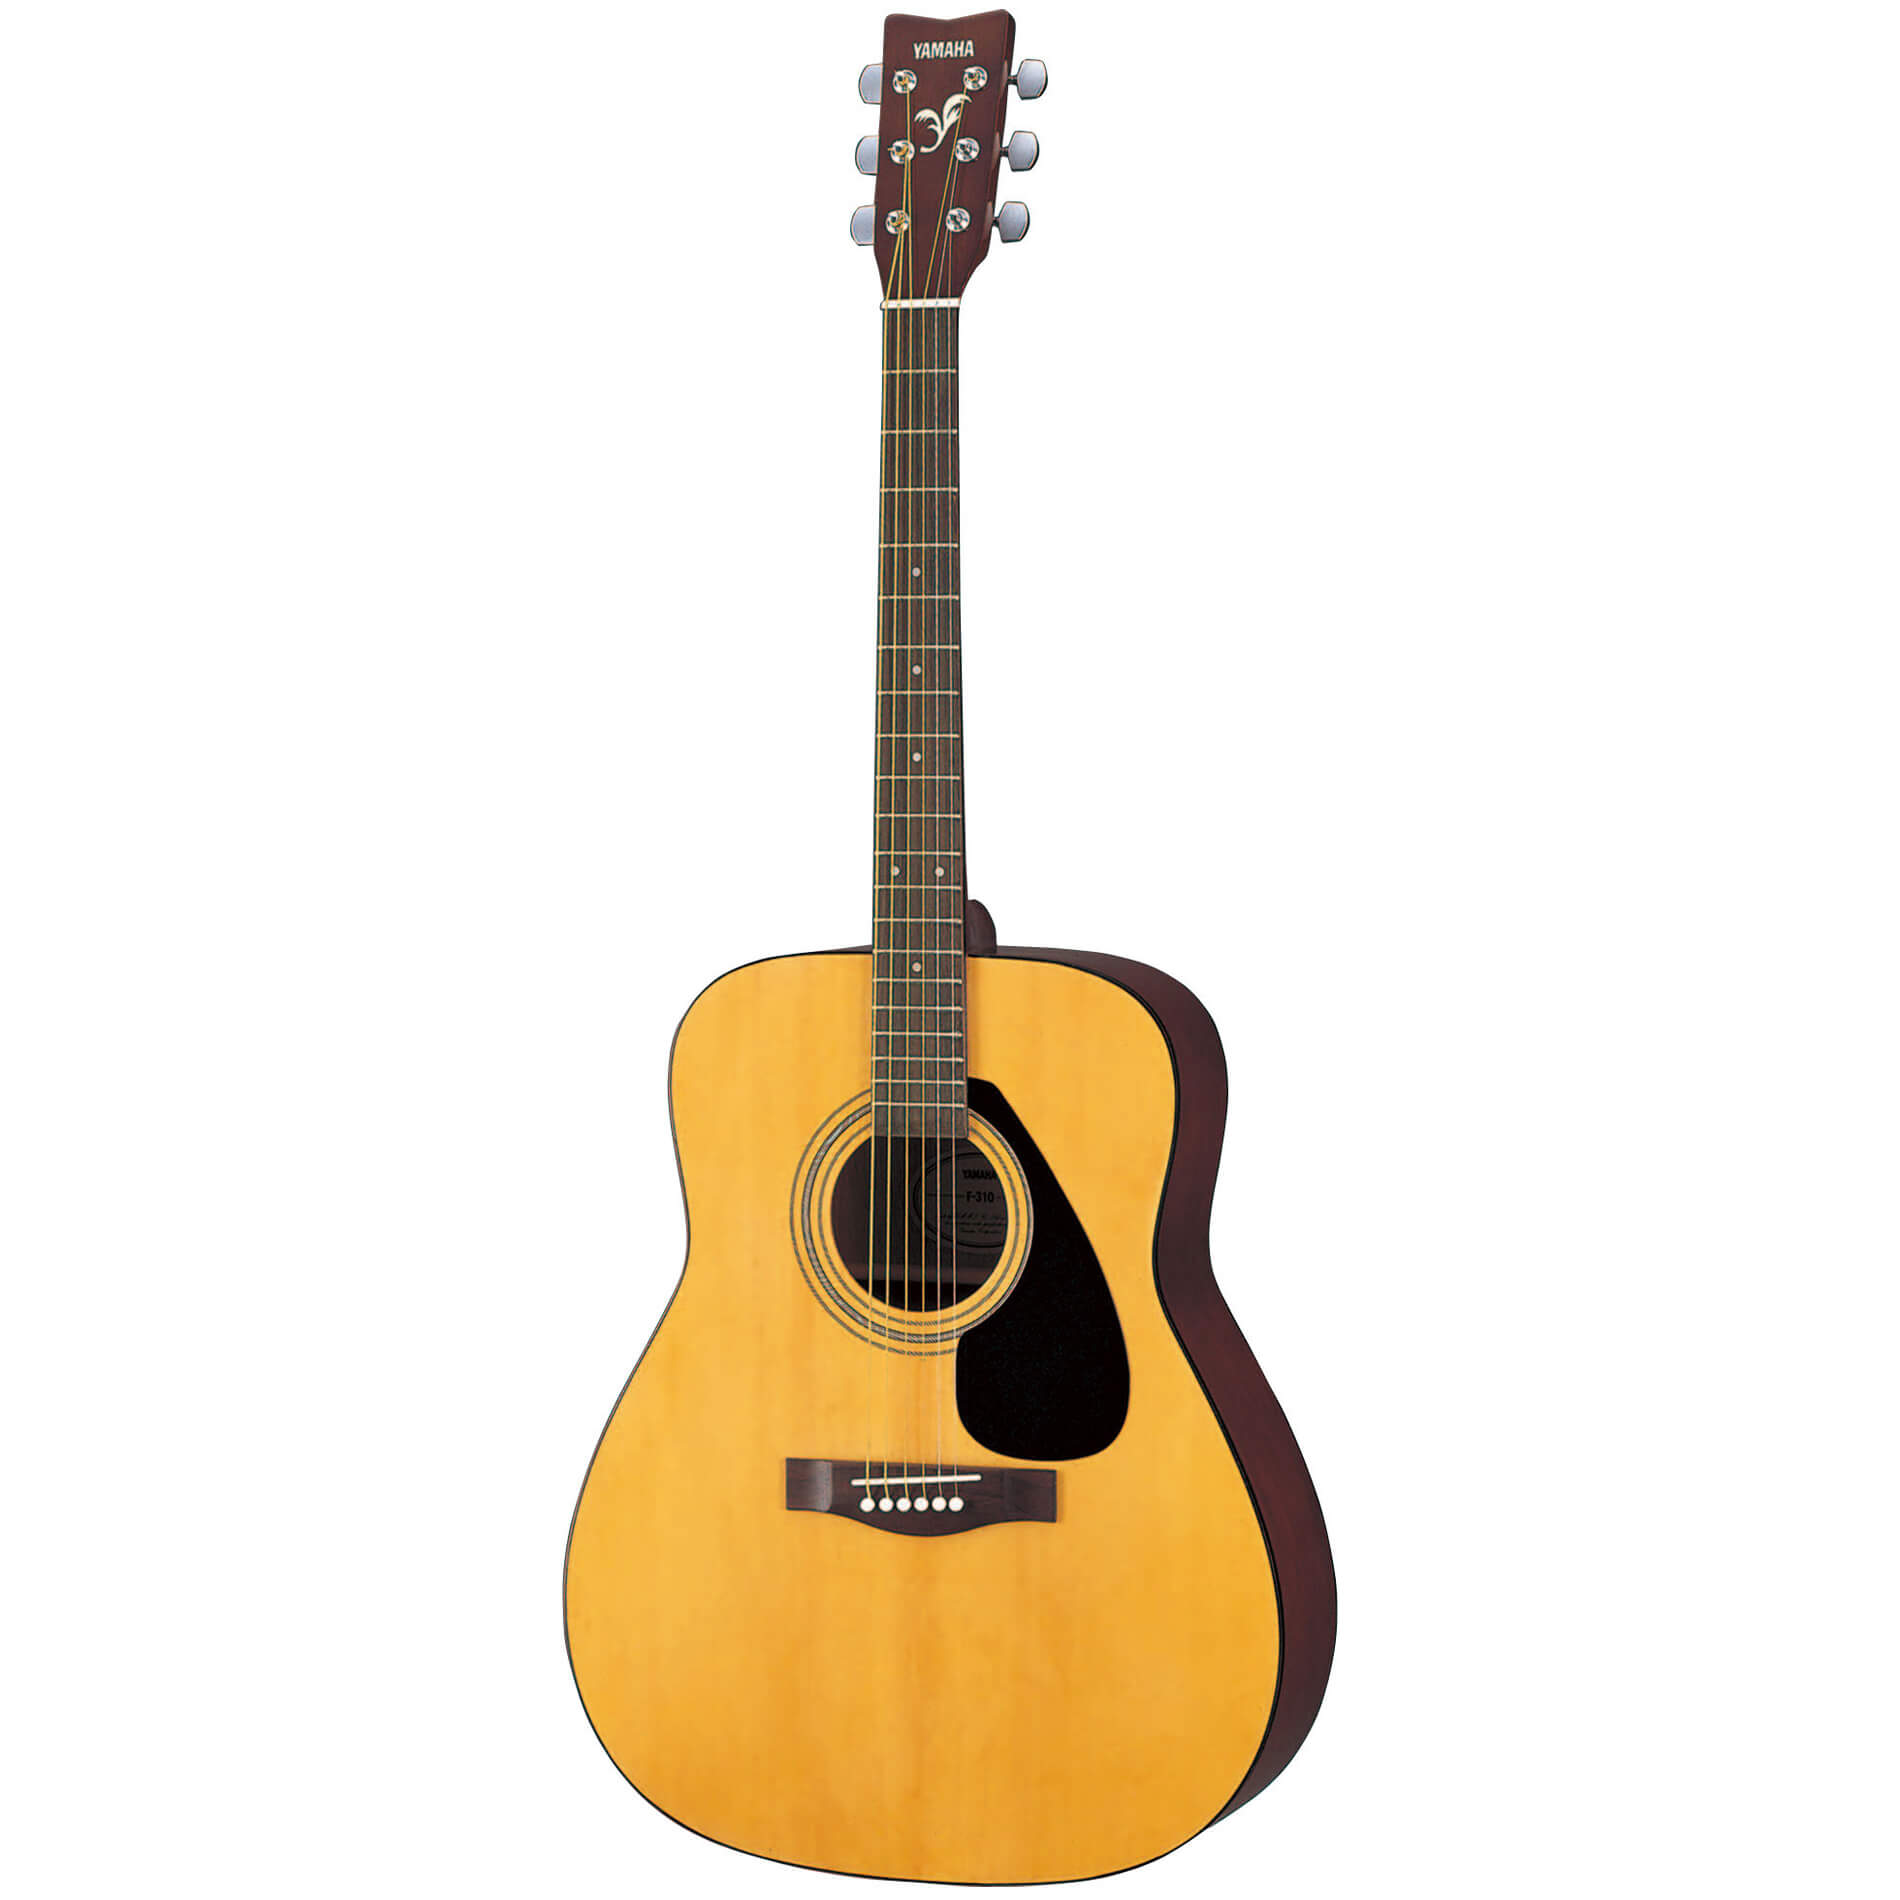 Все виды гитар картинки